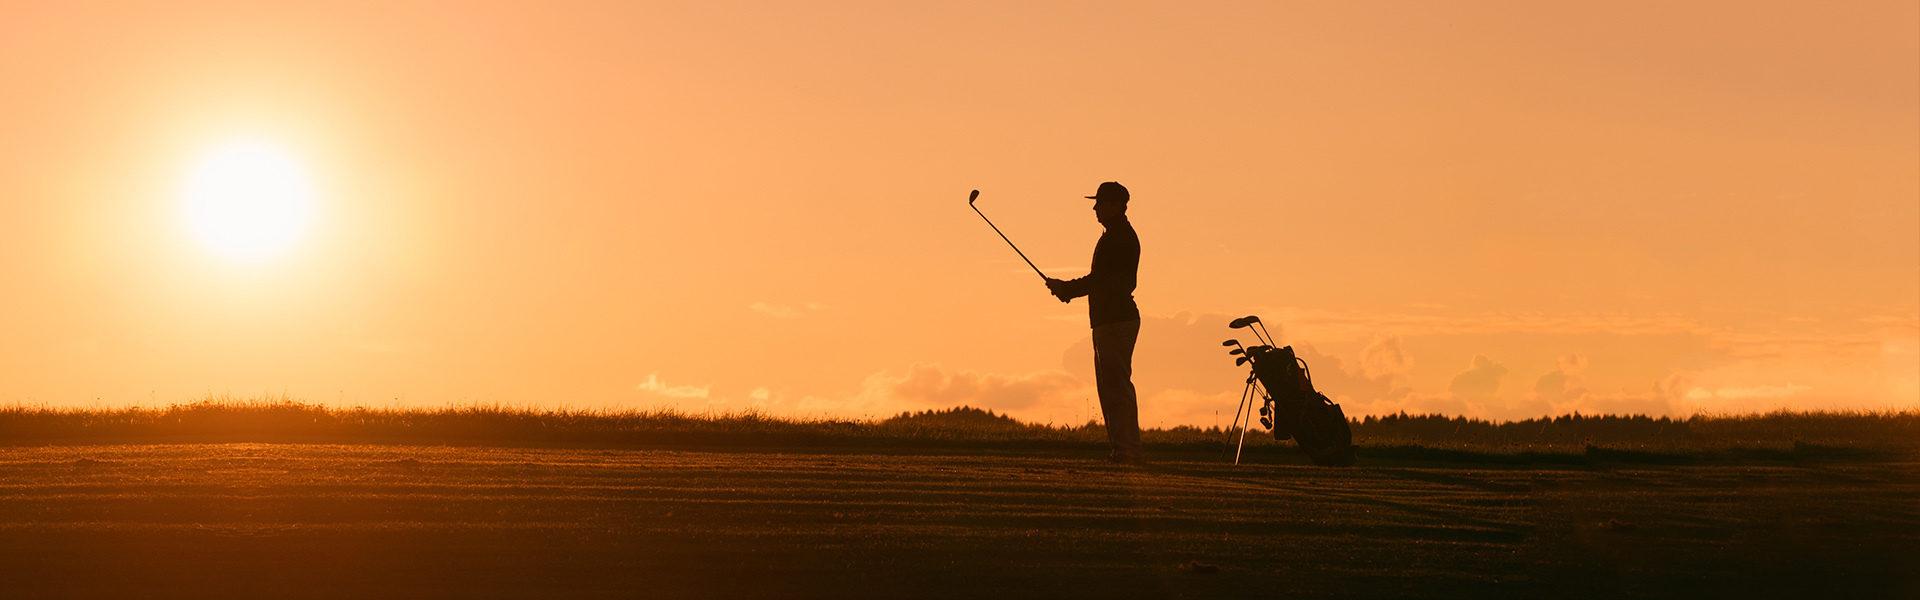 Melchester Golf Club